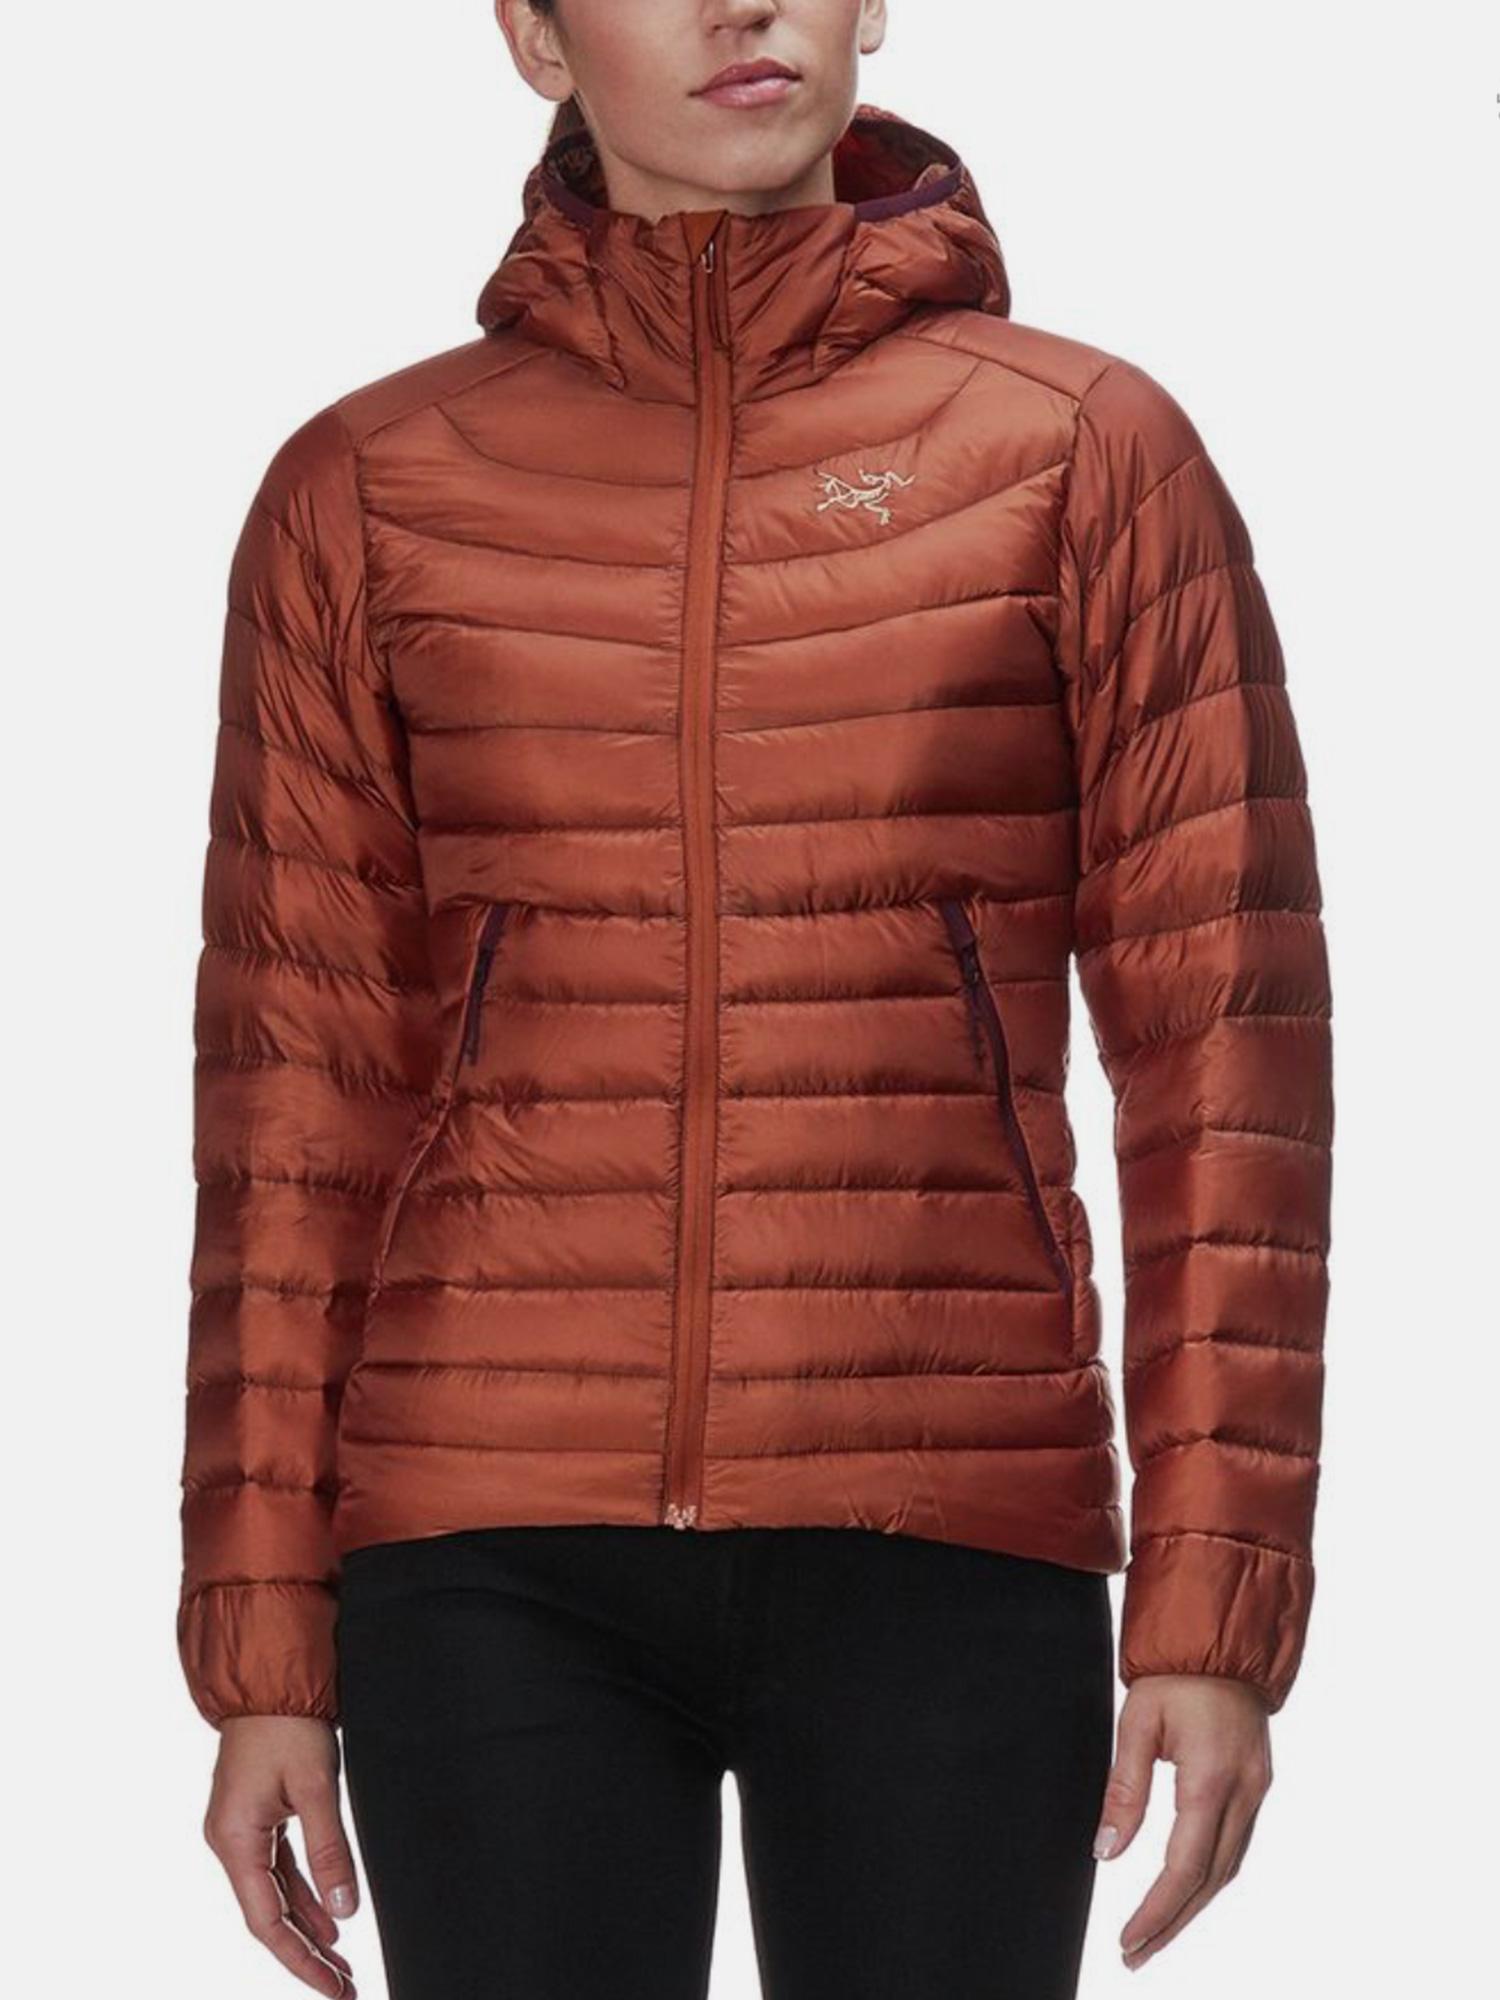 Arc'teryx Down Jacket - $379